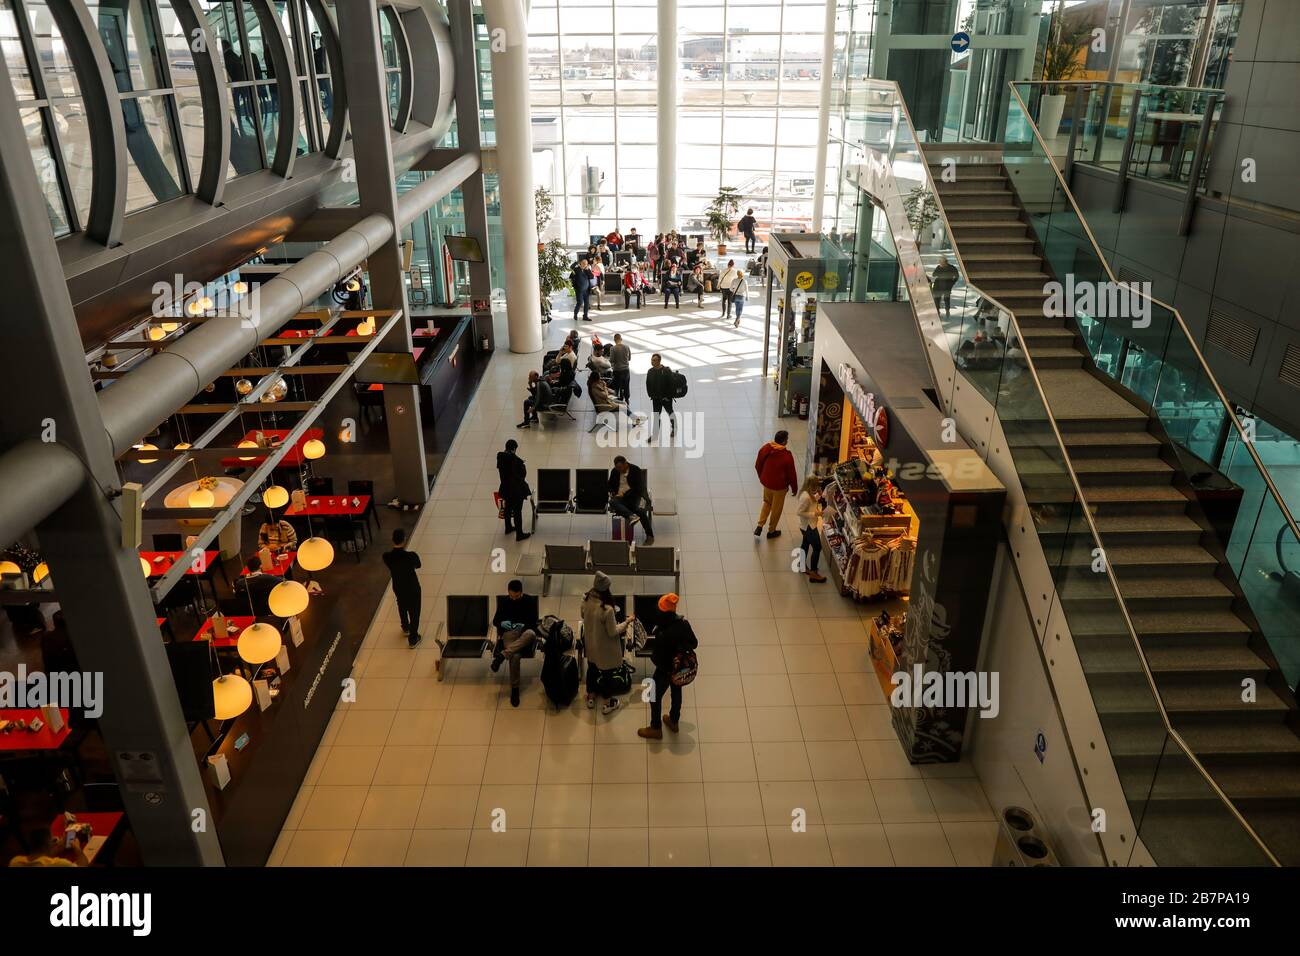 Otopeni, Rumania - 25 de febrero de 2020: Pasajeros dentro del Aeropuerto Internacional Henri Coanda, cerca de Bucarest, Rumania. Foto de stock